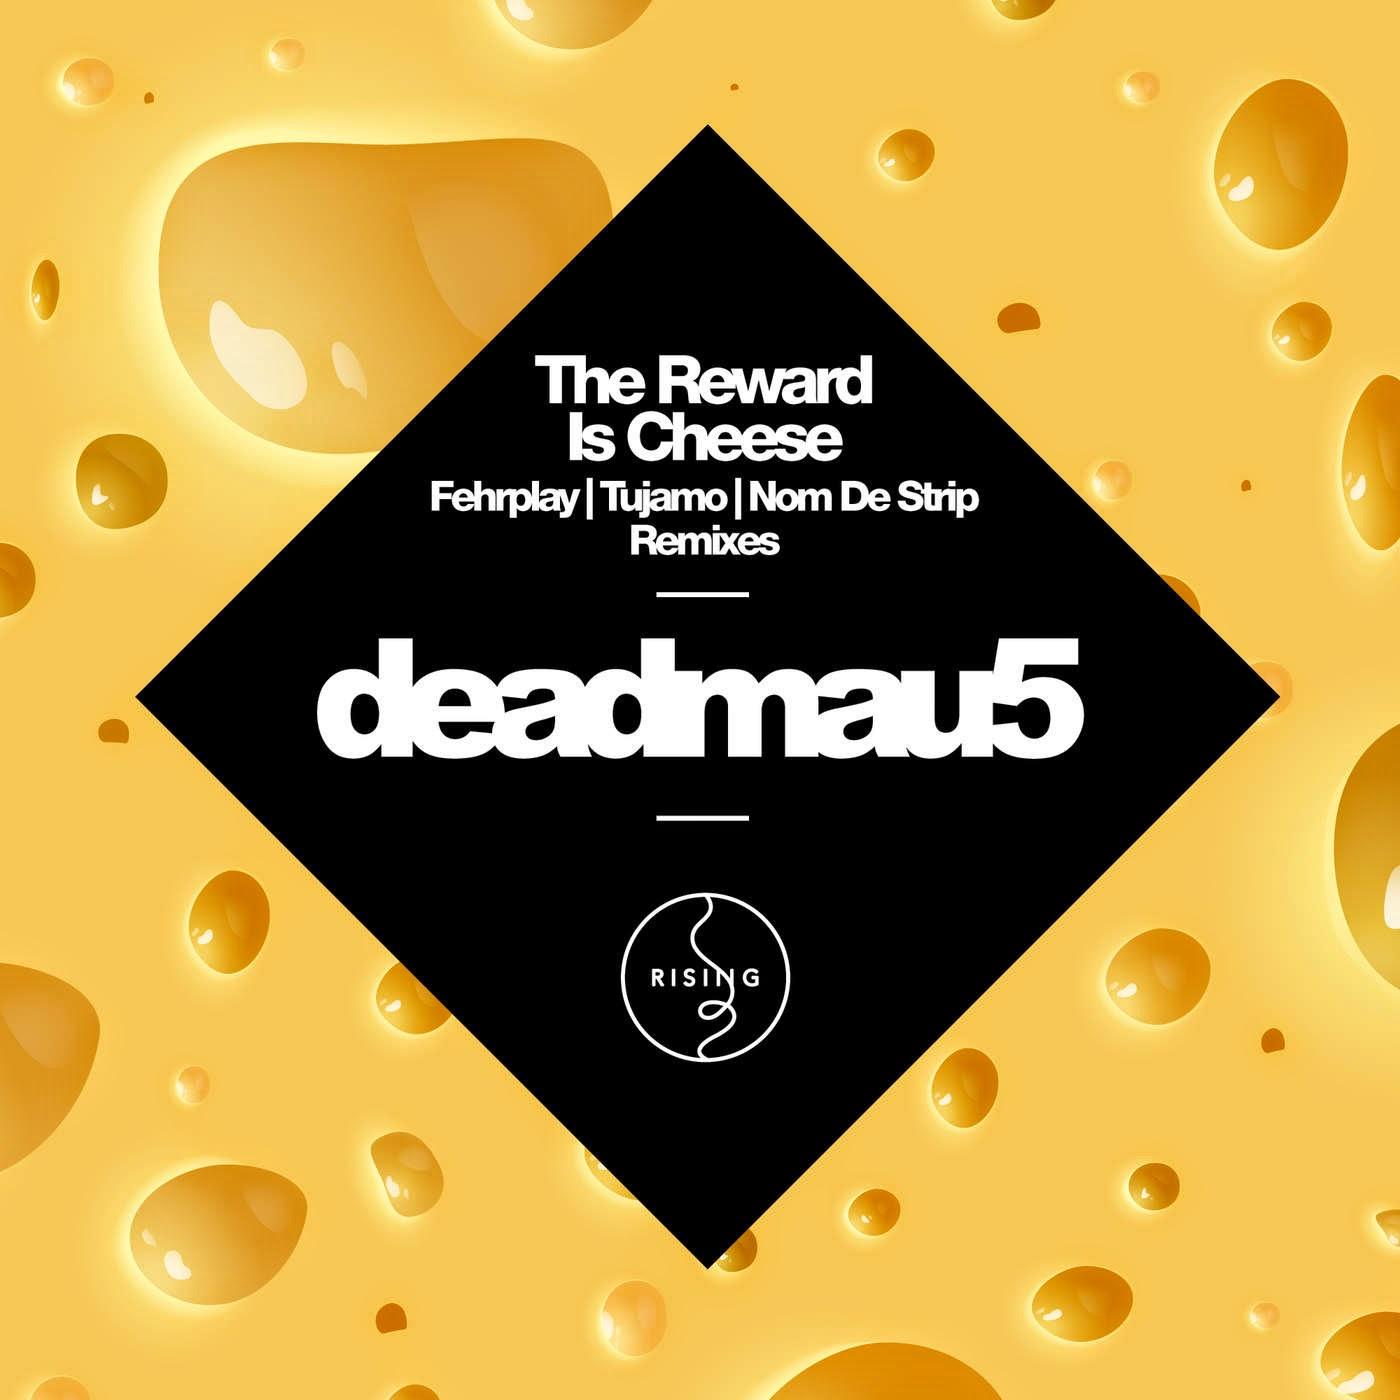 deadmau5 - The Reward Is Cheese - Remixes - Single  Cover